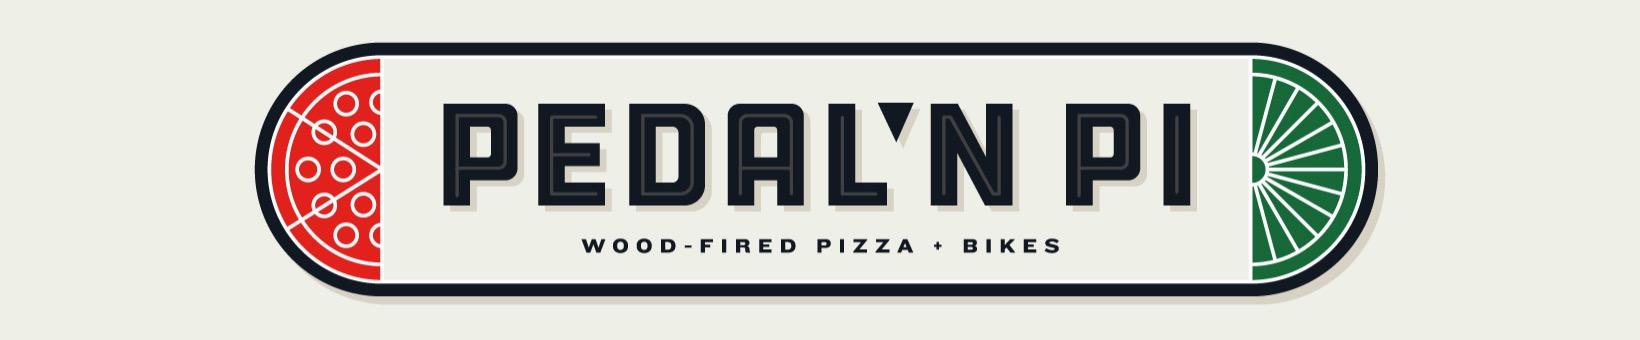 Pedal N Pi wood fired pizza and bikes - logo